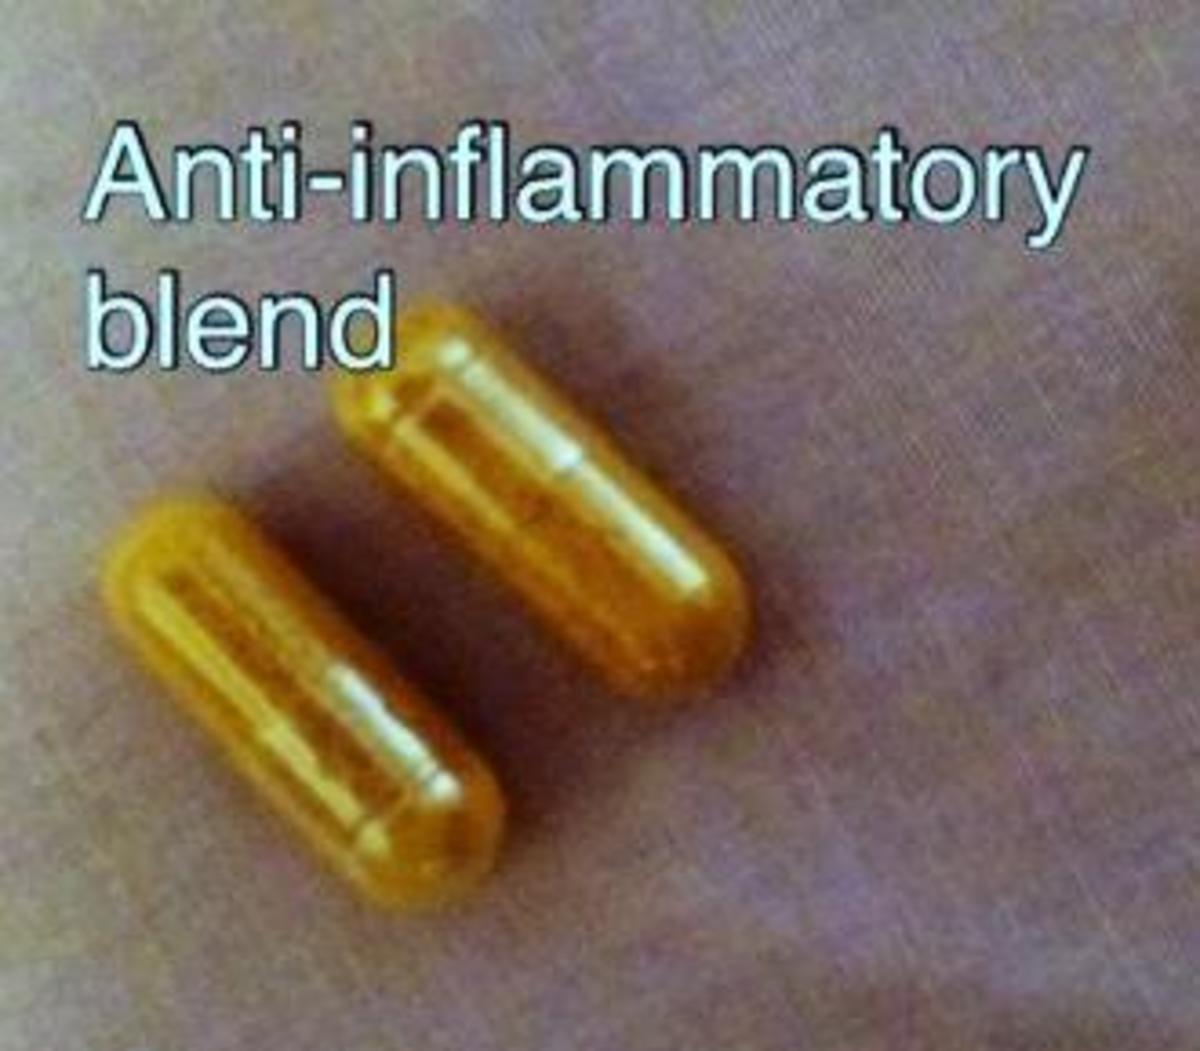 FTG anti-inflammatory blend